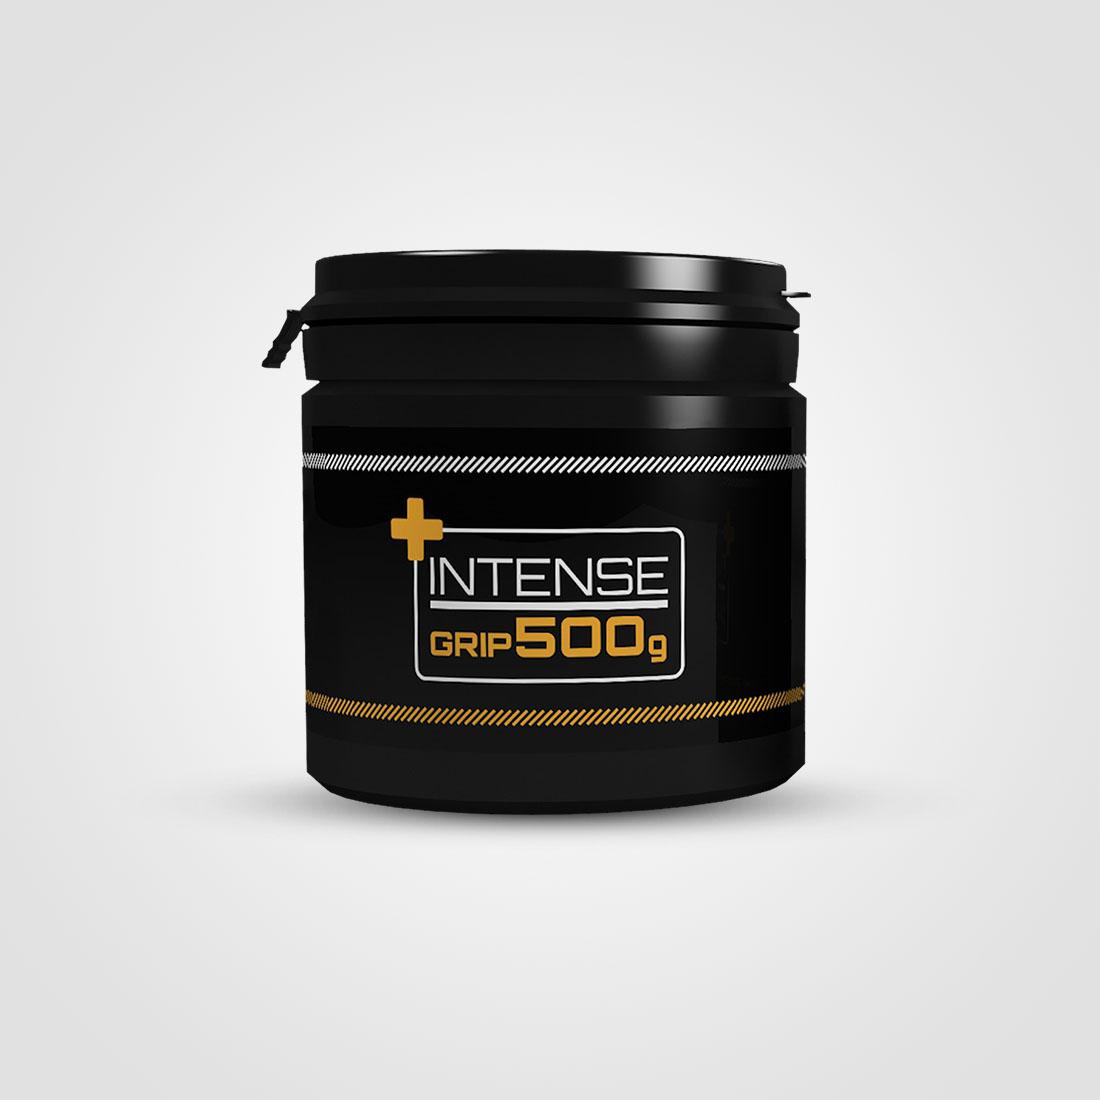 NTENSE GRIP 500G